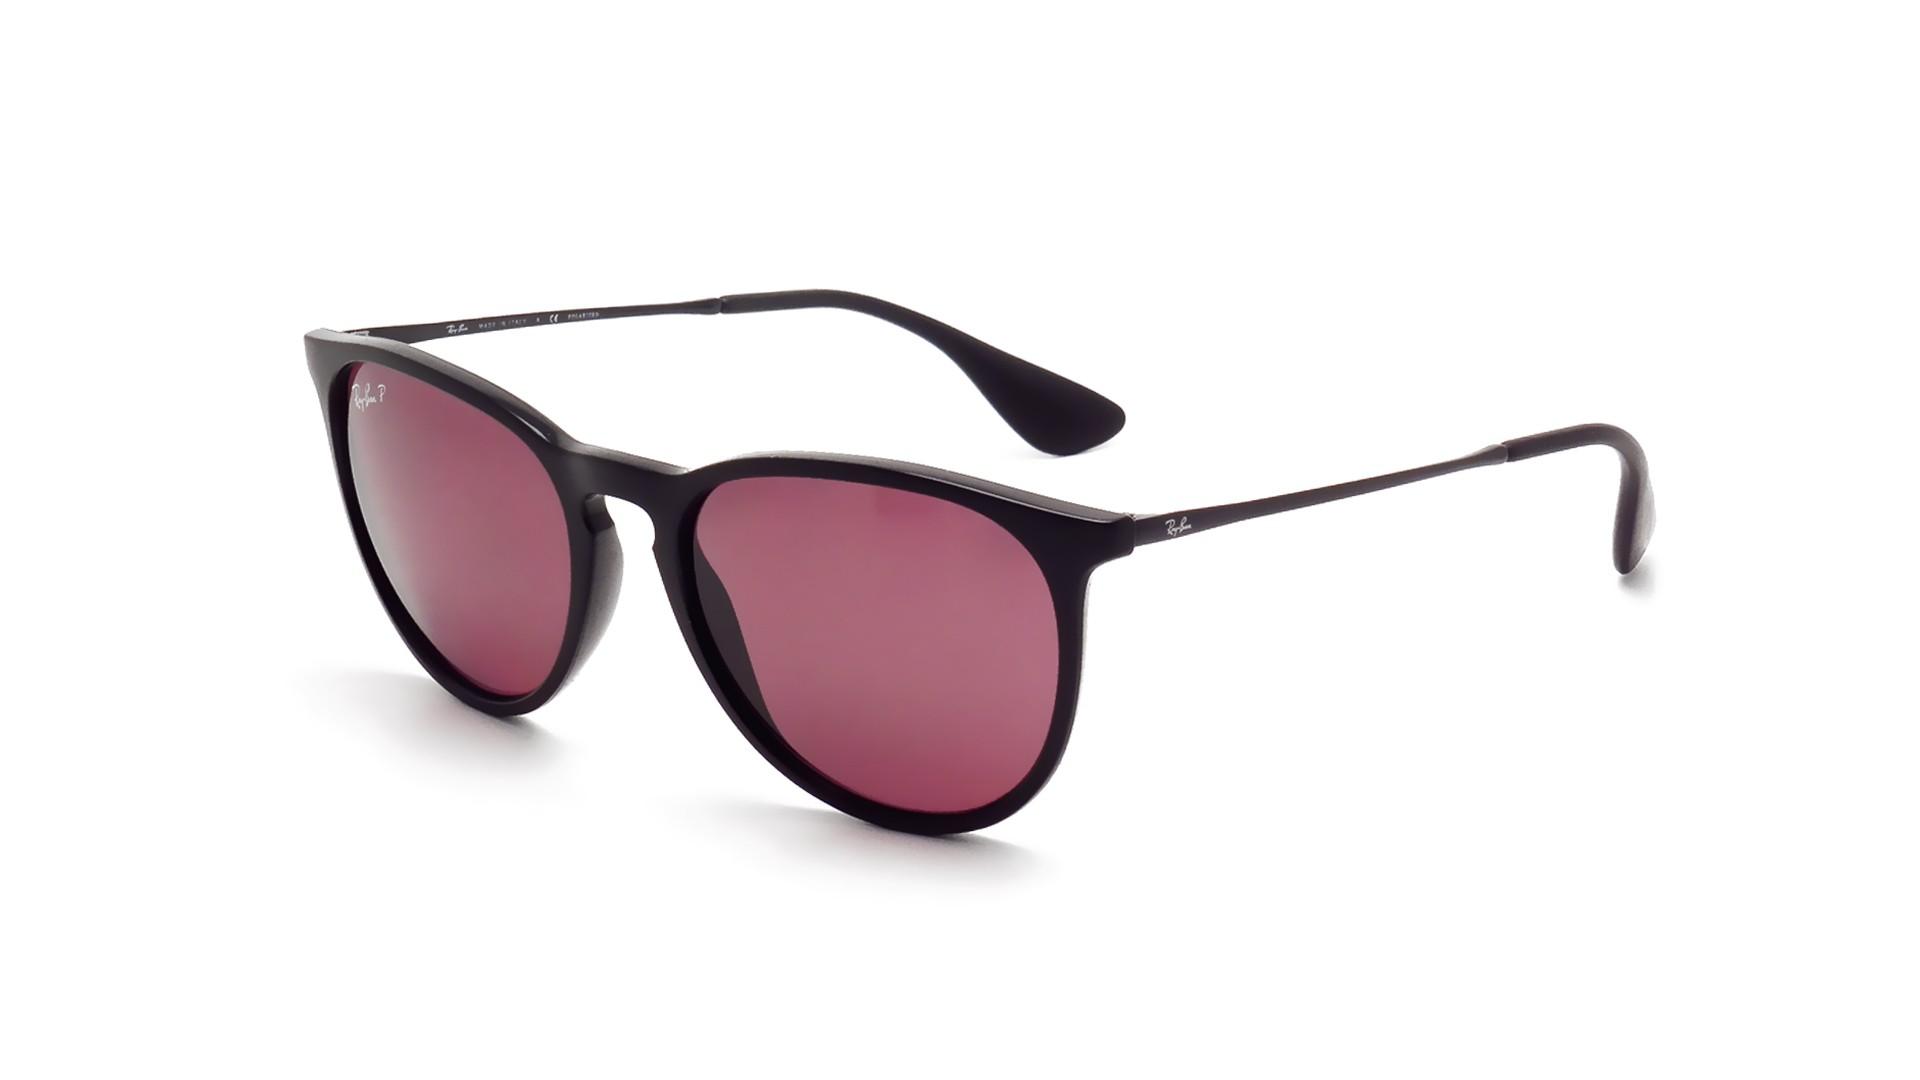 78ba68ea7e Sunglasses Ray-Ban Erika Black RB4171 601 5Q 54-18 Medium Polarized